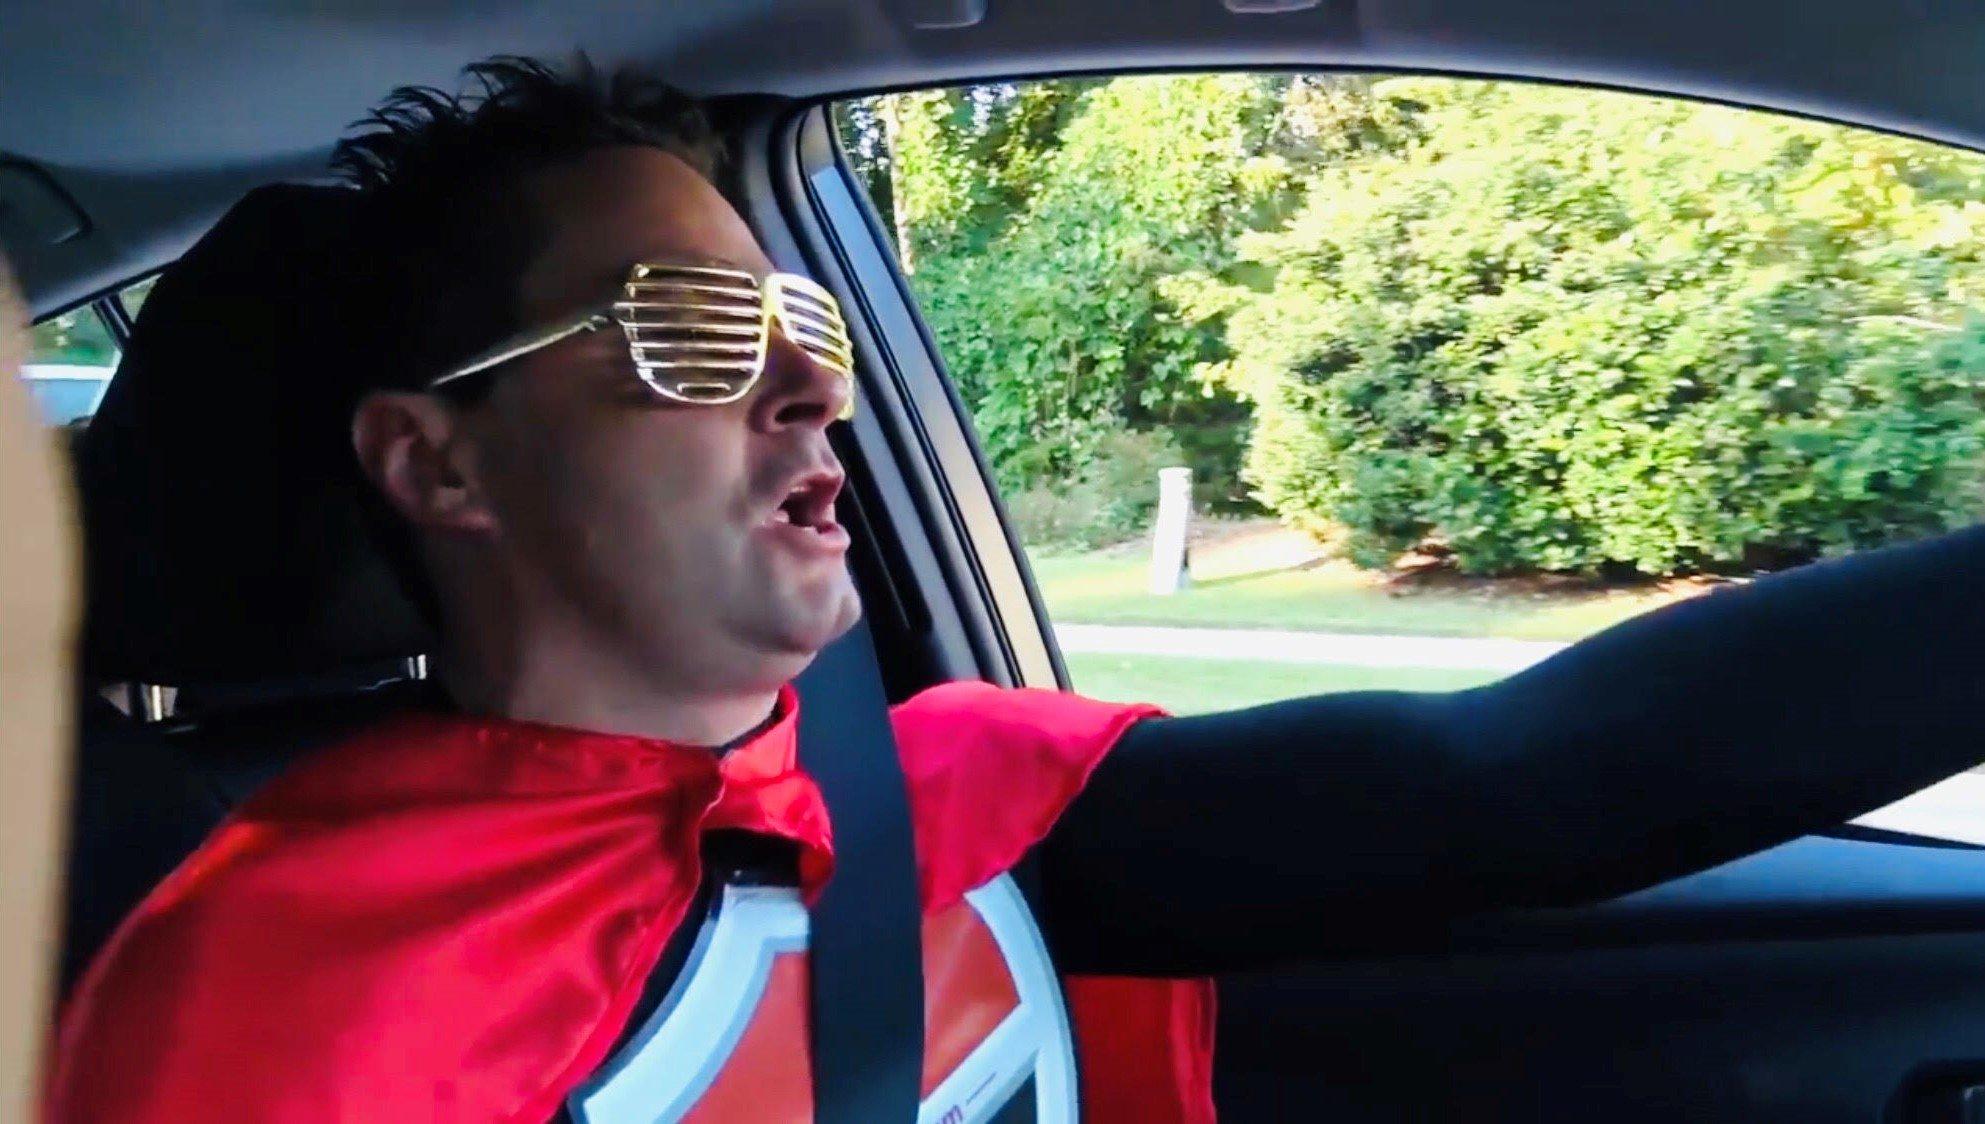 Toyota Jeff dressed as a superhero